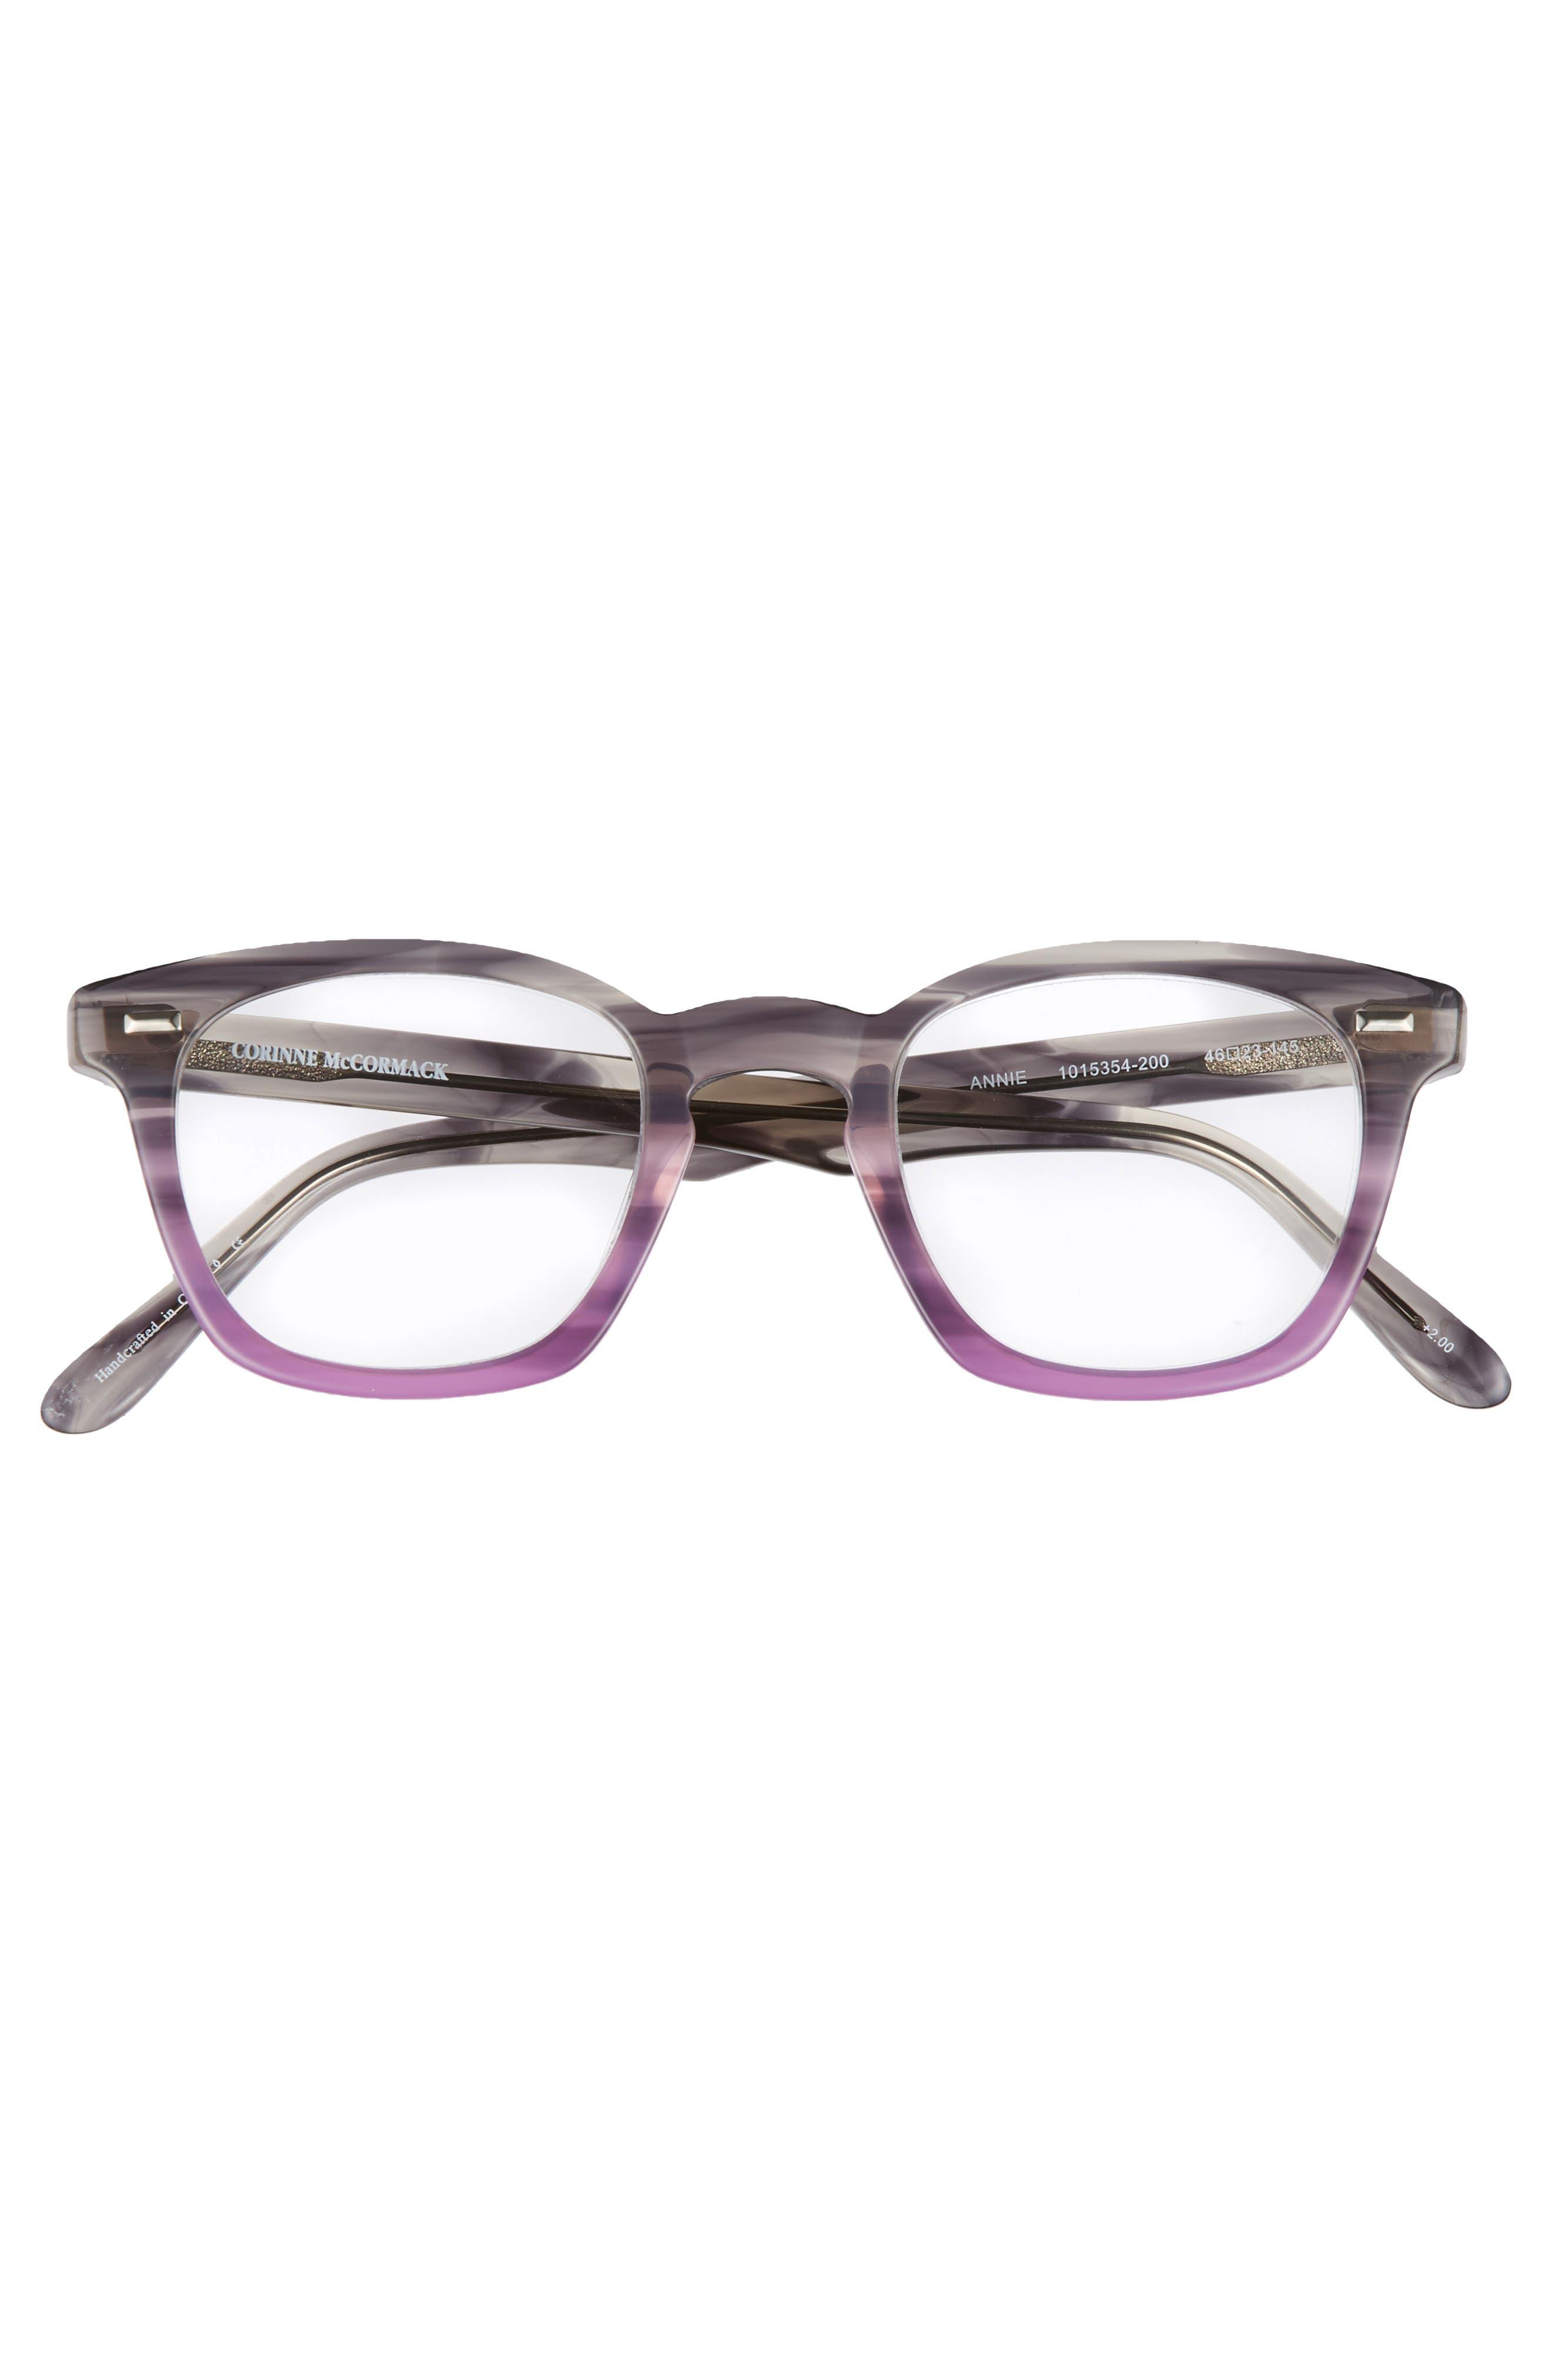 Annie 46mm Reading Glasses,                             Alternate thumbnail 3, color,                             020